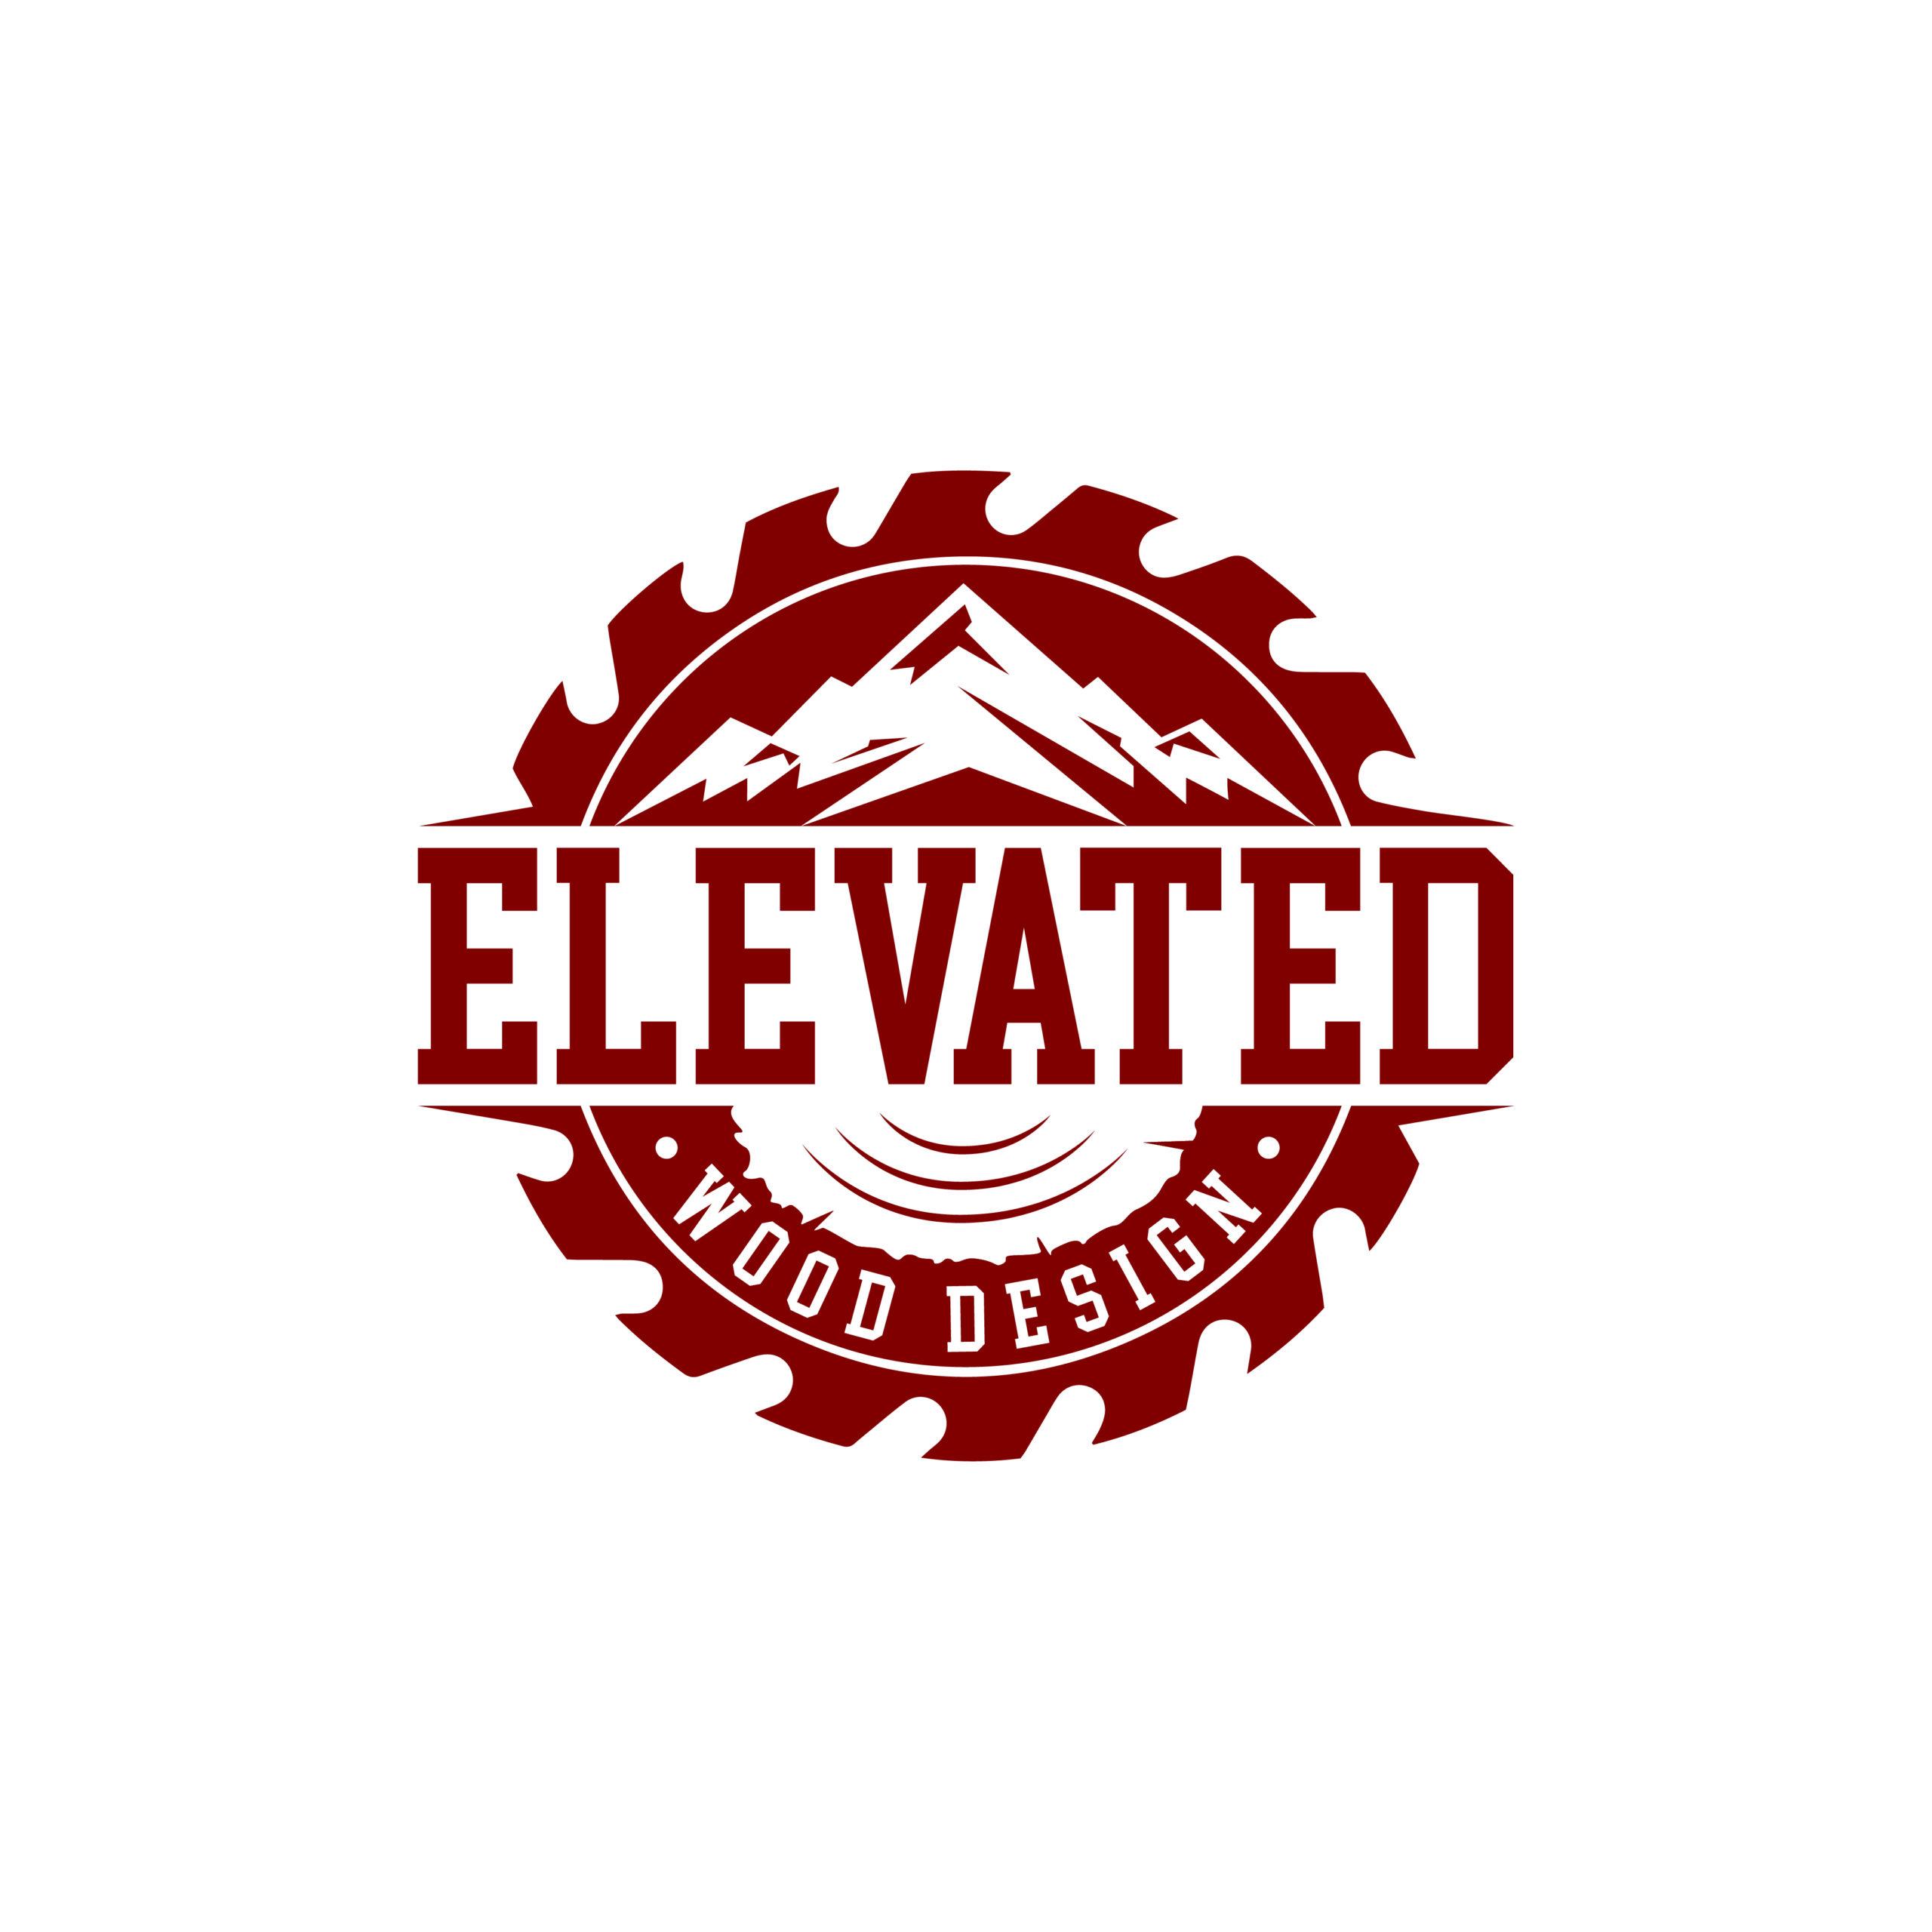 Elevated Wood Design - Idaho Falls Logo Design